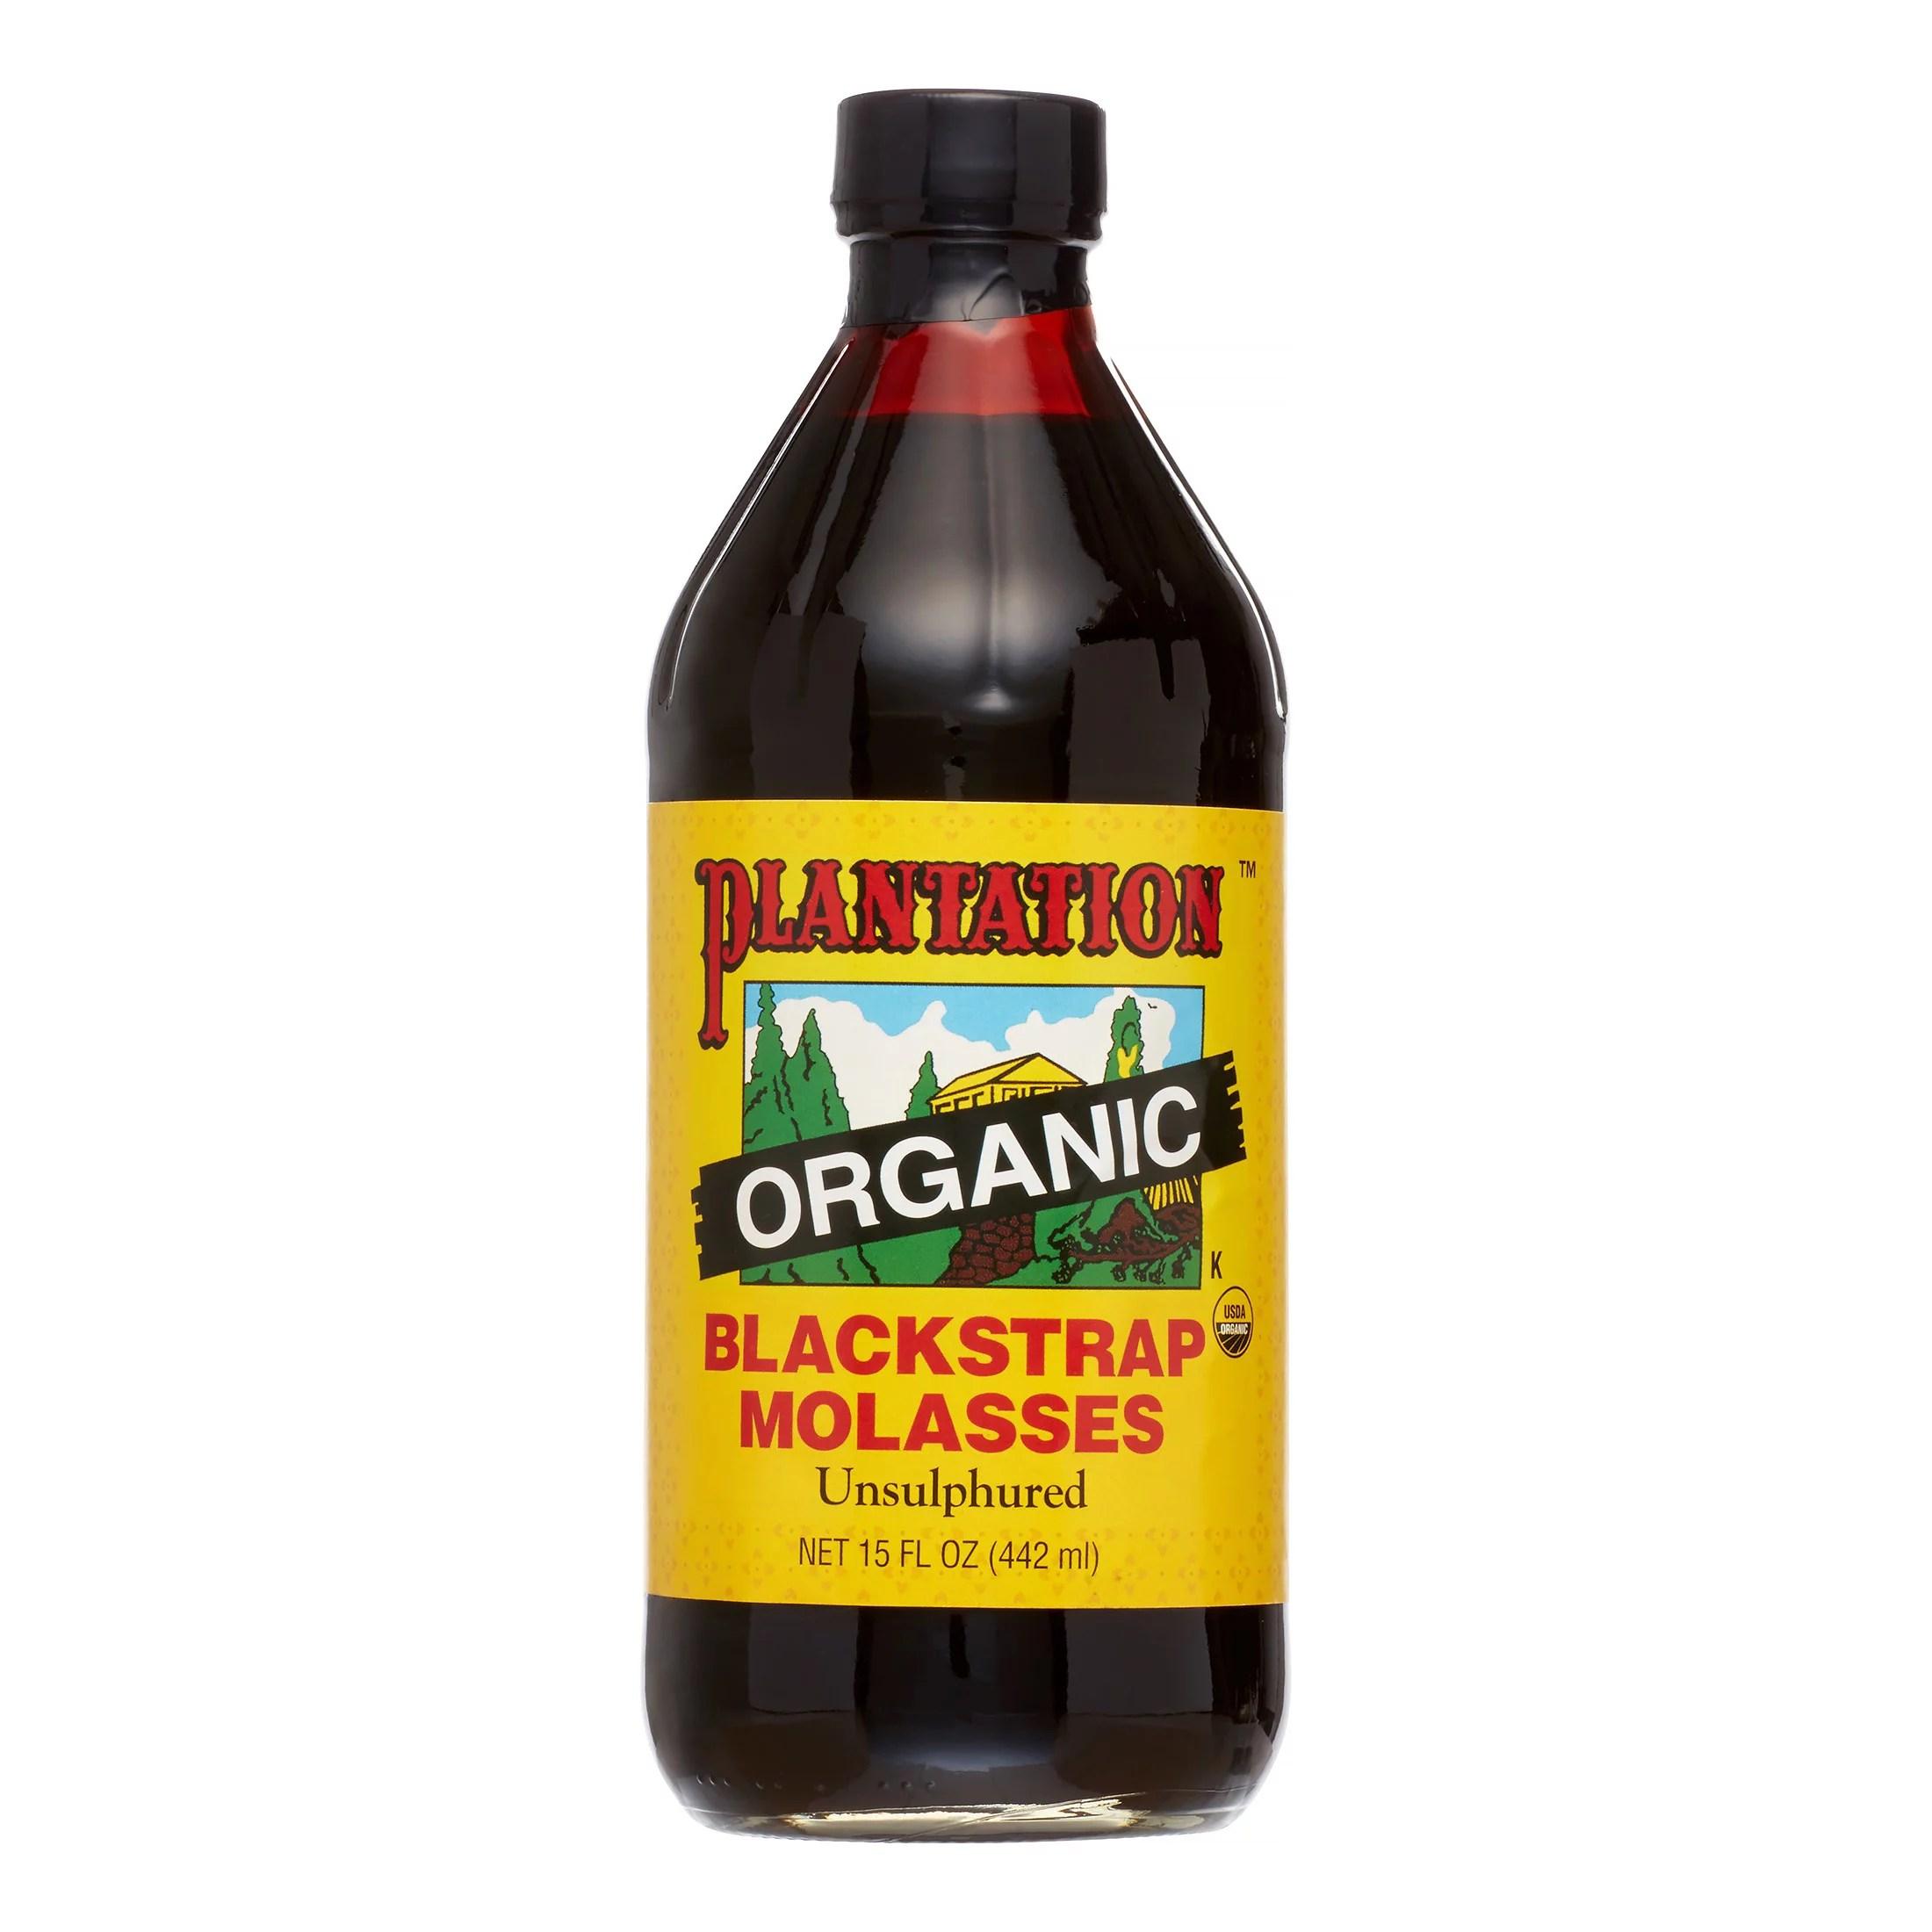 Plantation Organic Blackstrap Molasses 15 Fl Oz - Walmart.com